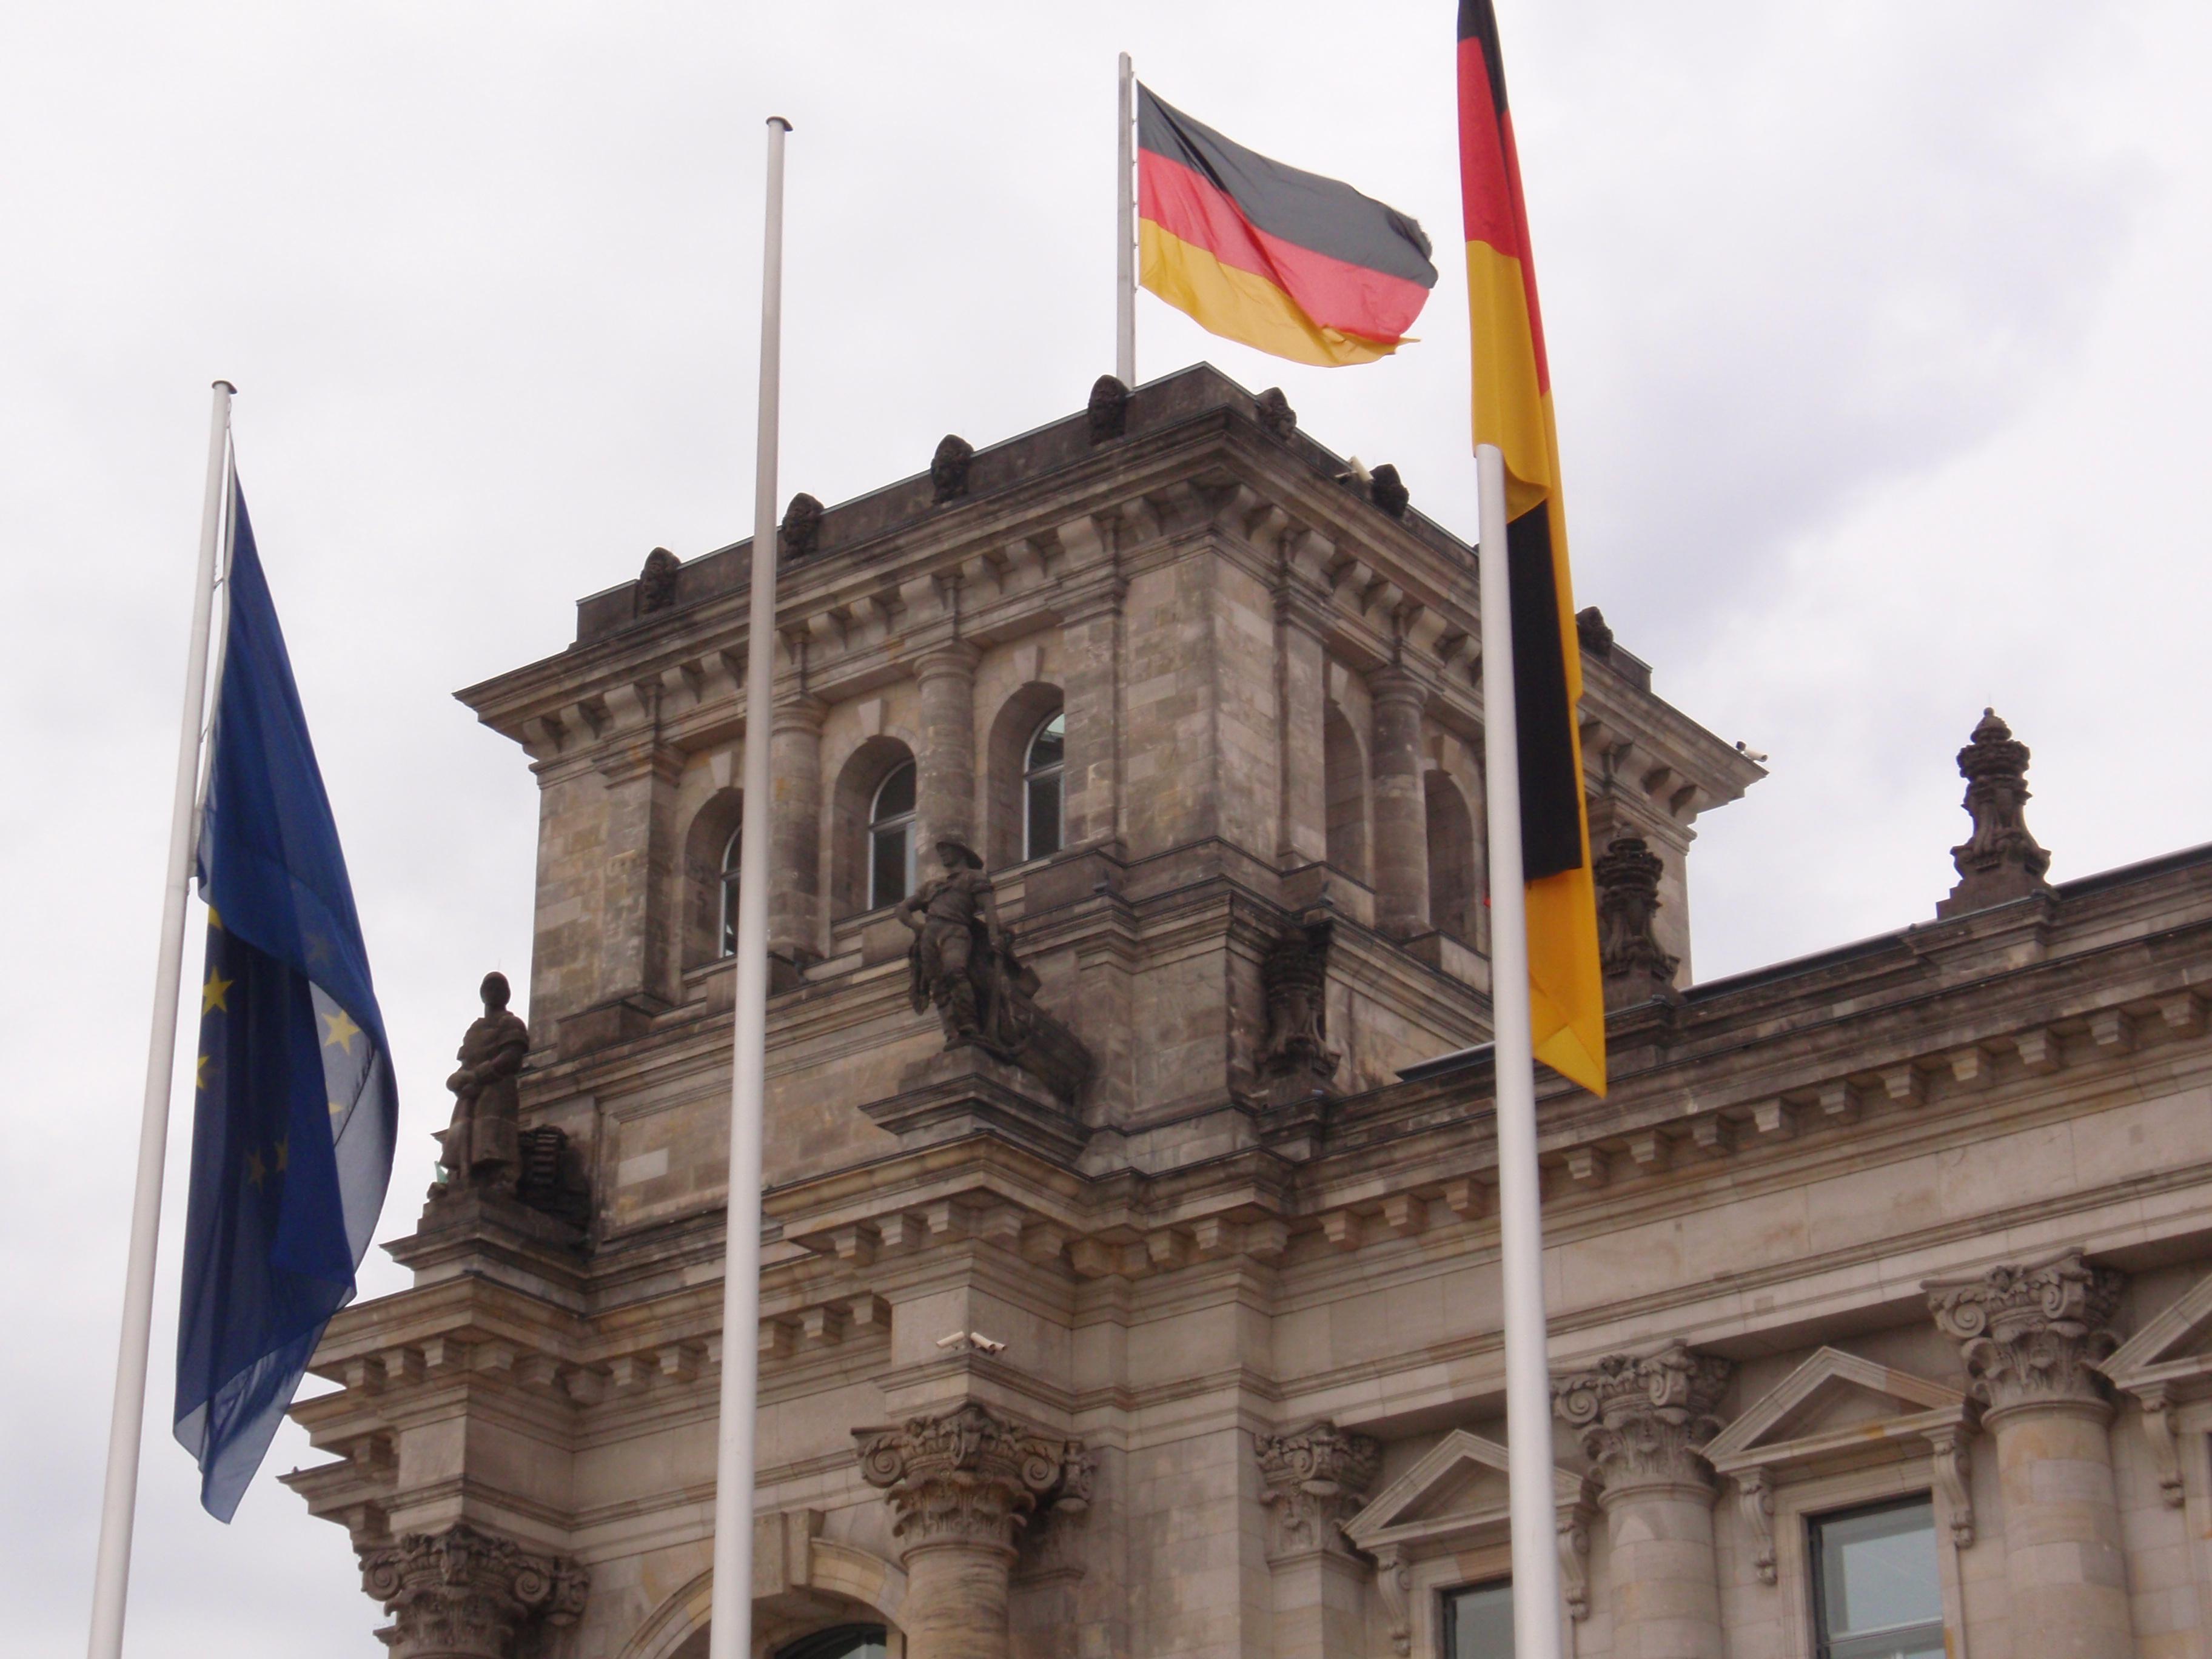 Bund Rheinland-Pfalz